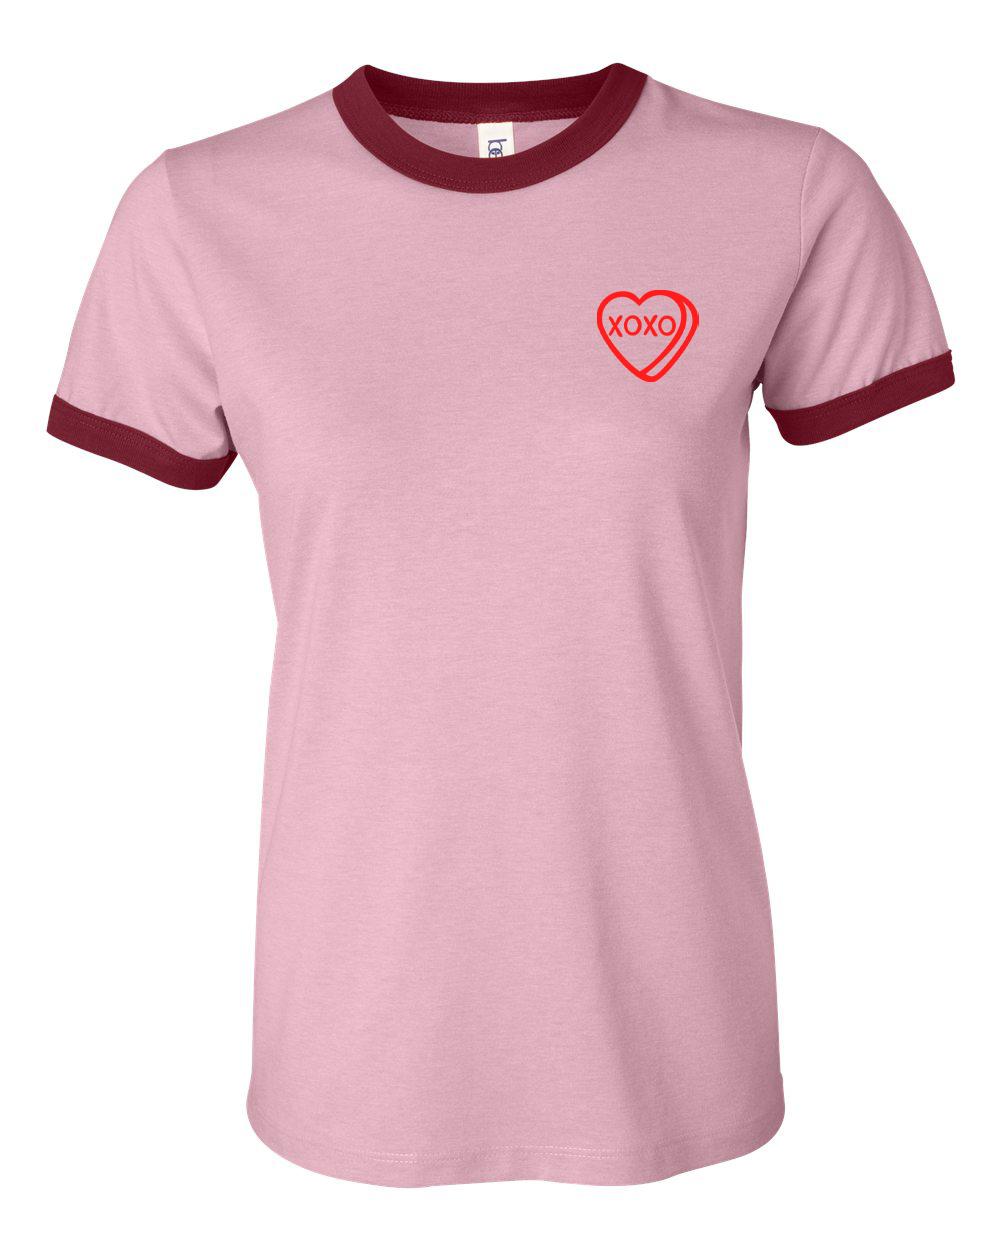 custom design of bella 6050 Ladies' Short Sleeve Heather Ringer T-Shirt